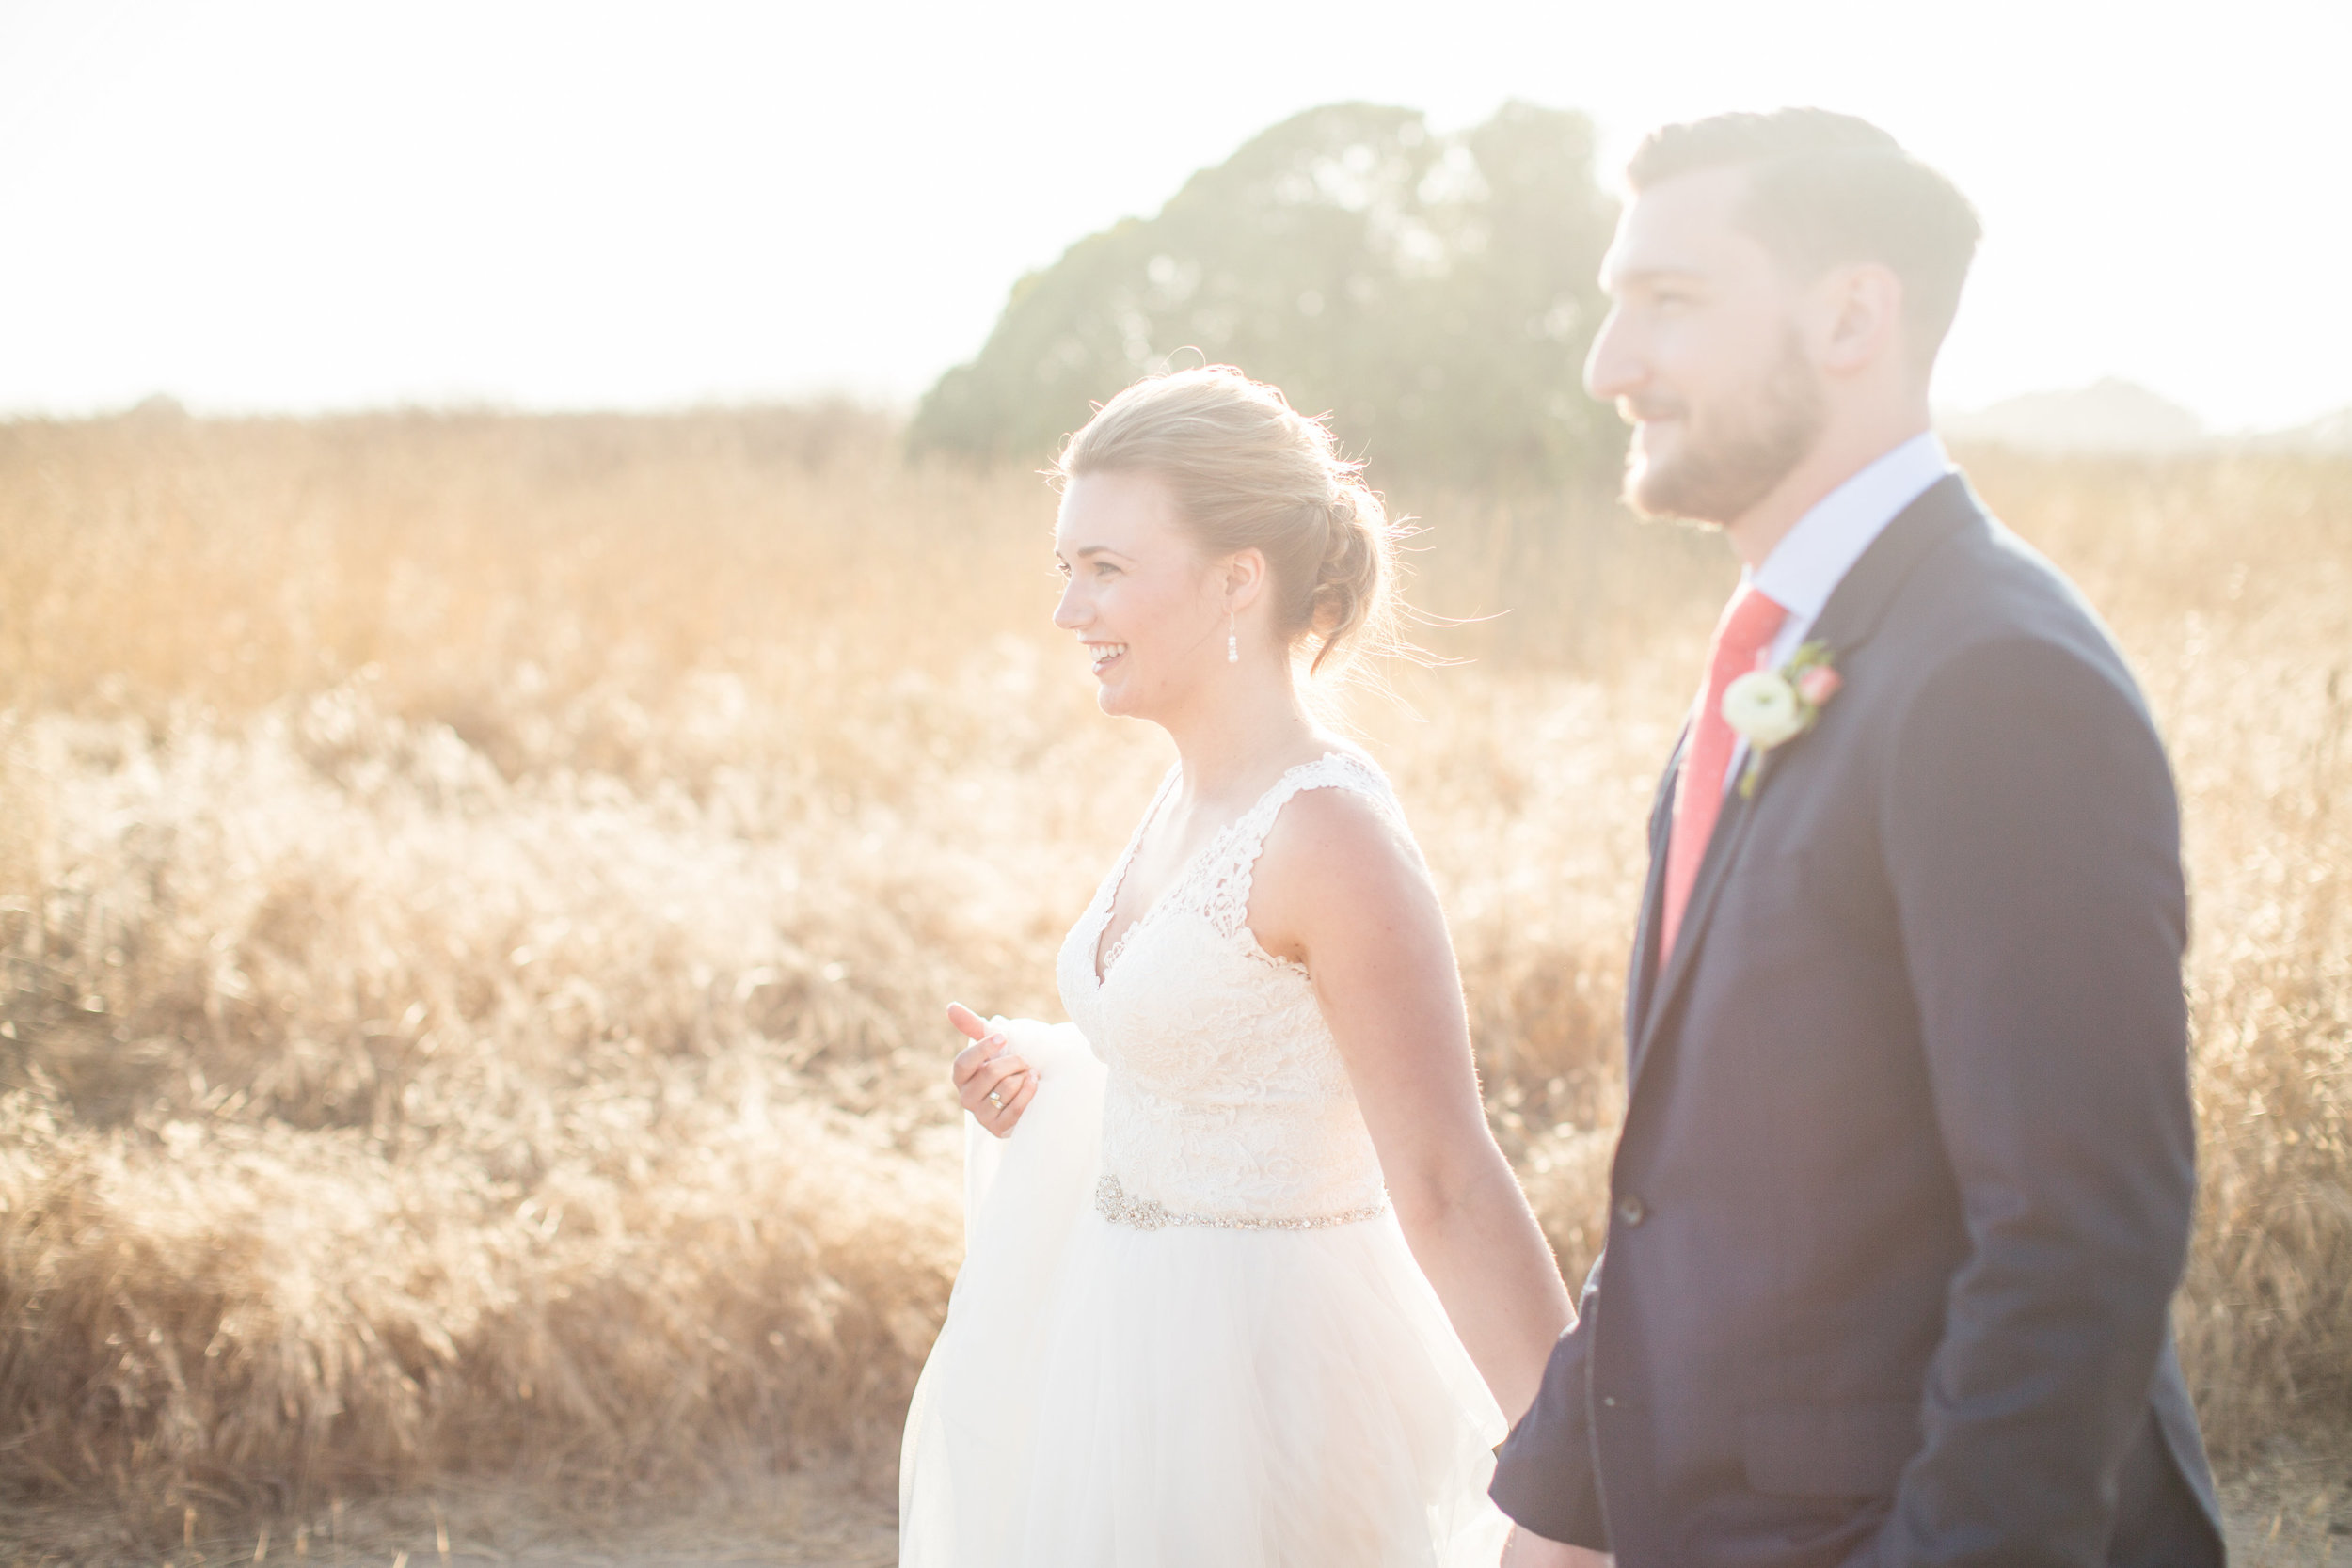 santa-barbara-elopement-elope-wedding-planning-planner-coordinator-day-of-rustic-ellwood-bluffs-beach-front-ocean-view (5).jpg